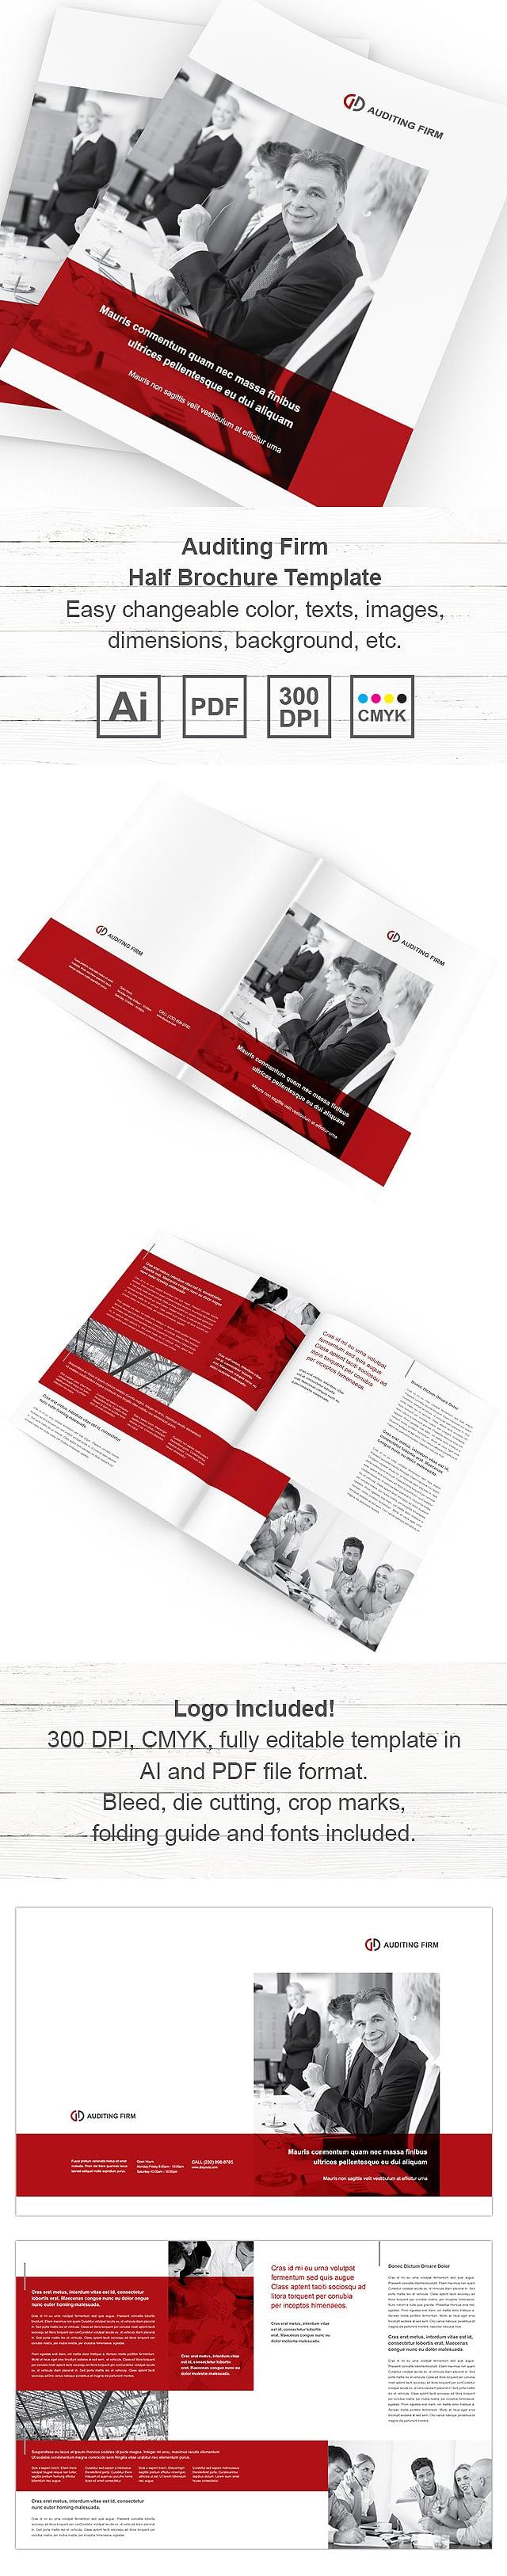 Auditing Firm Half Fold Brochure Template